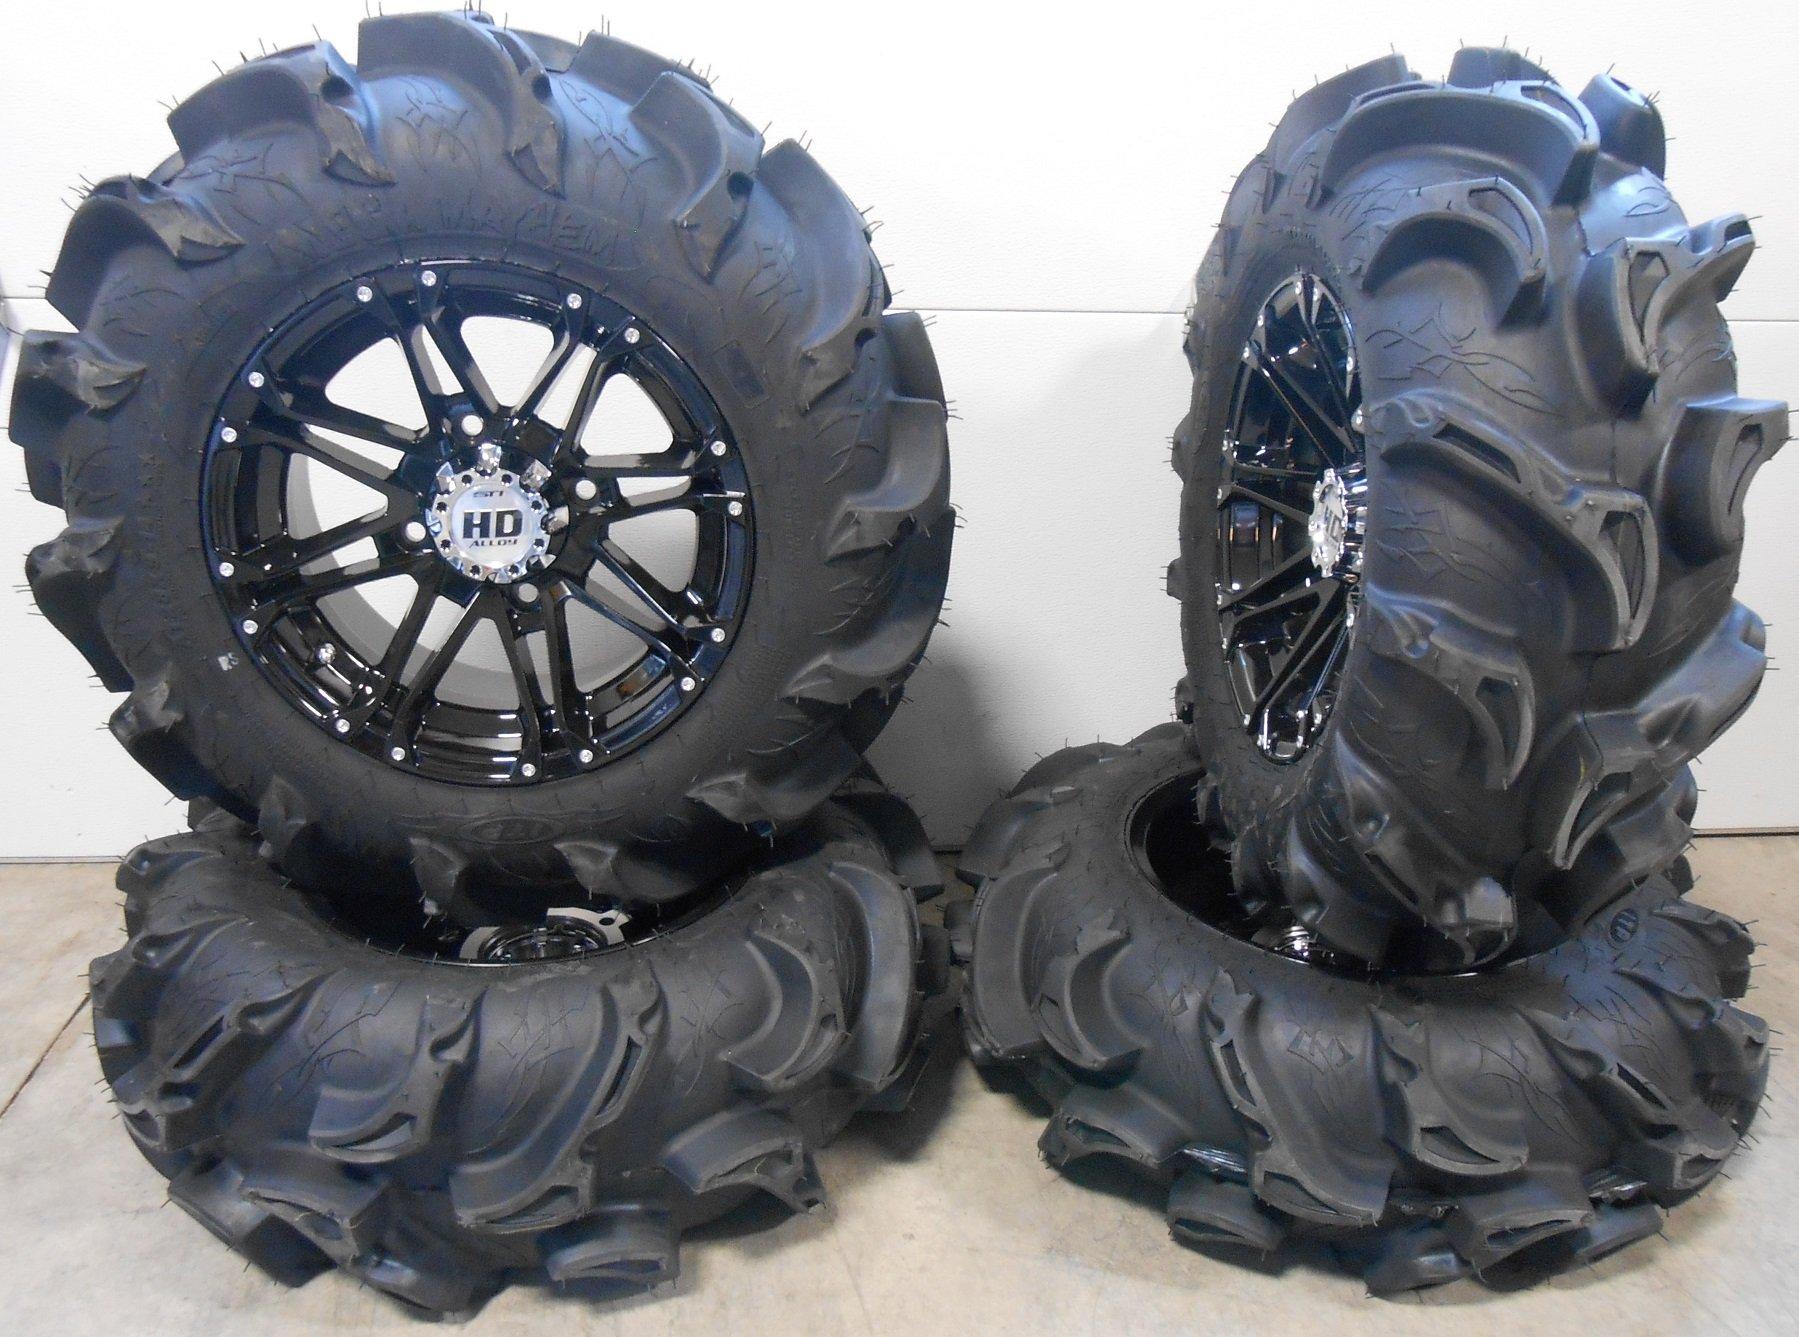 Bundle - 9 Items: STI HD3 14'' Wheels Black 28'' Mega Mayhem Tires [4x156 Bolt Pattern 3/8x24 Lug Kit]